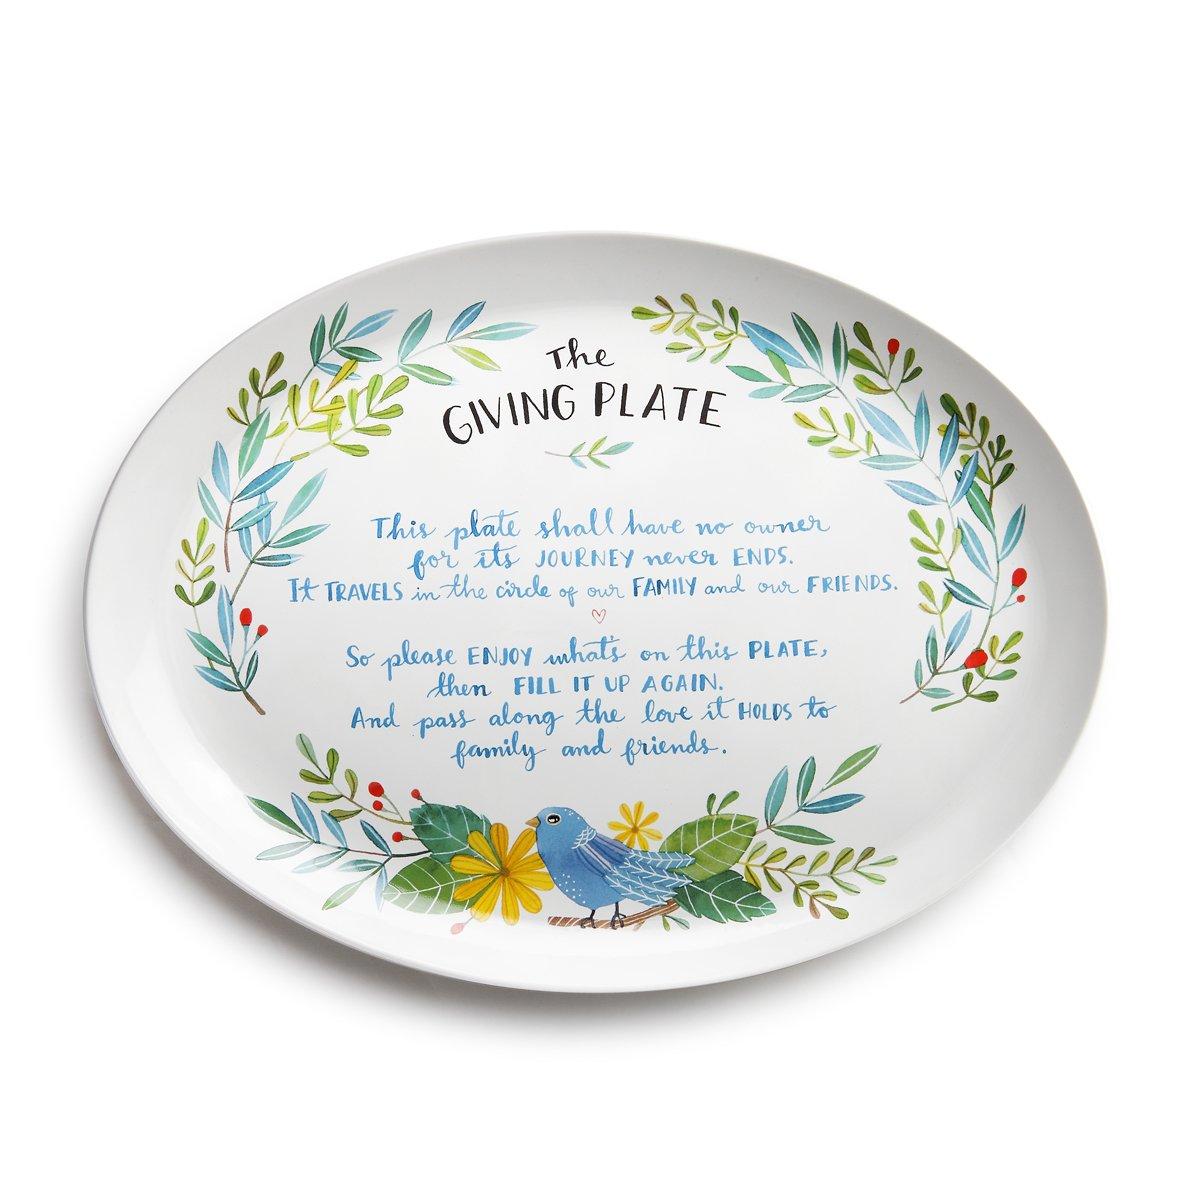 Traditional Giving Bird Blue Green Florish 12 x 9 Earthenware Oval Platter Demdaco 1004100008